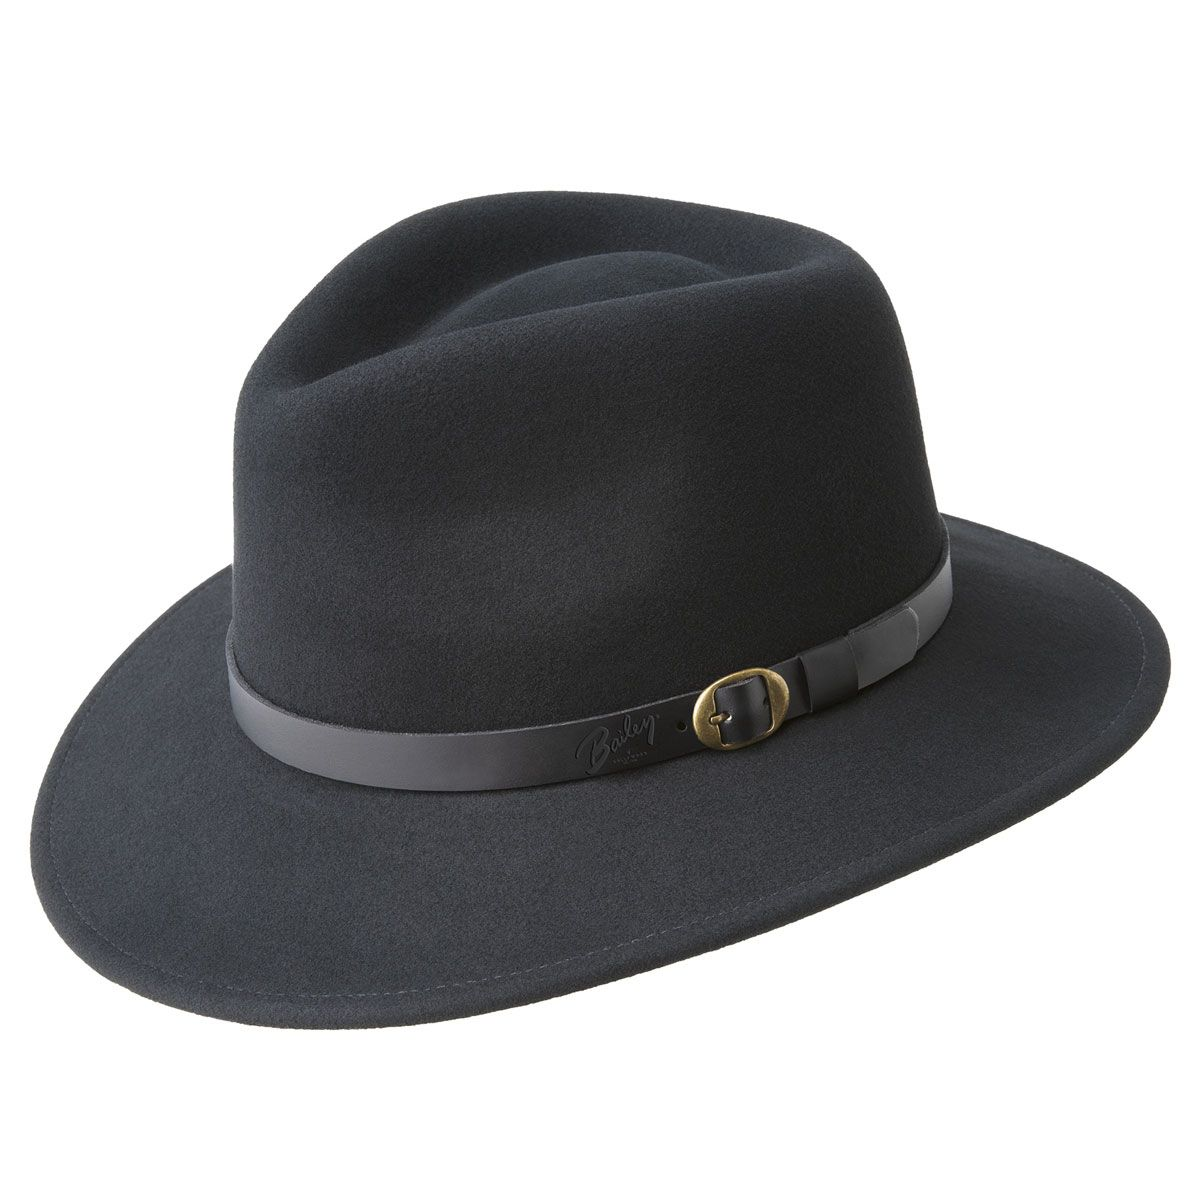 0c0cdb342 Bailey Hats Briar 7006